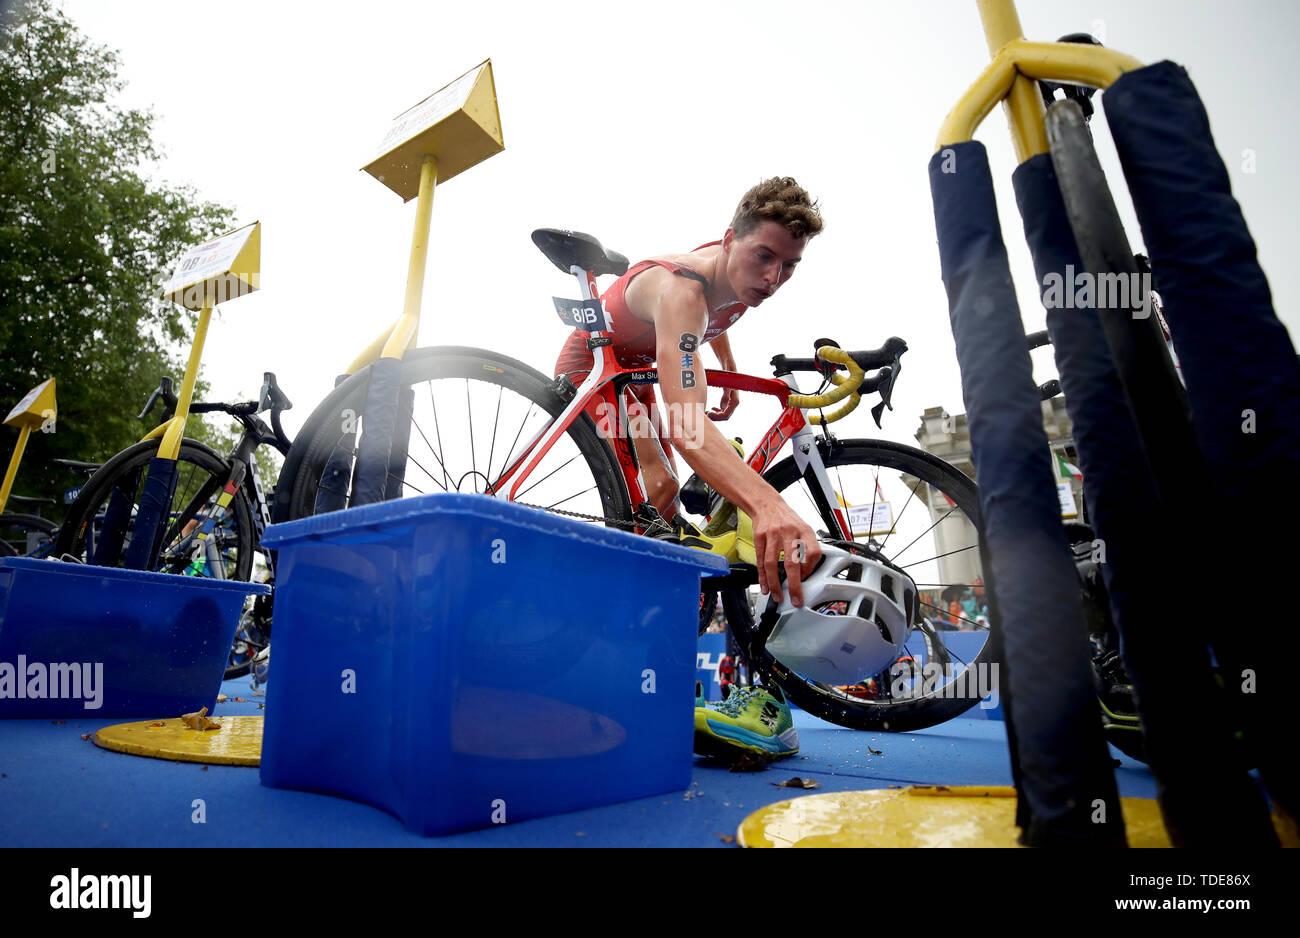 Switzerland's Max Studer during the Accenture World Triathlon Mixed Relay at Nottingham Embankment. - Stock Image